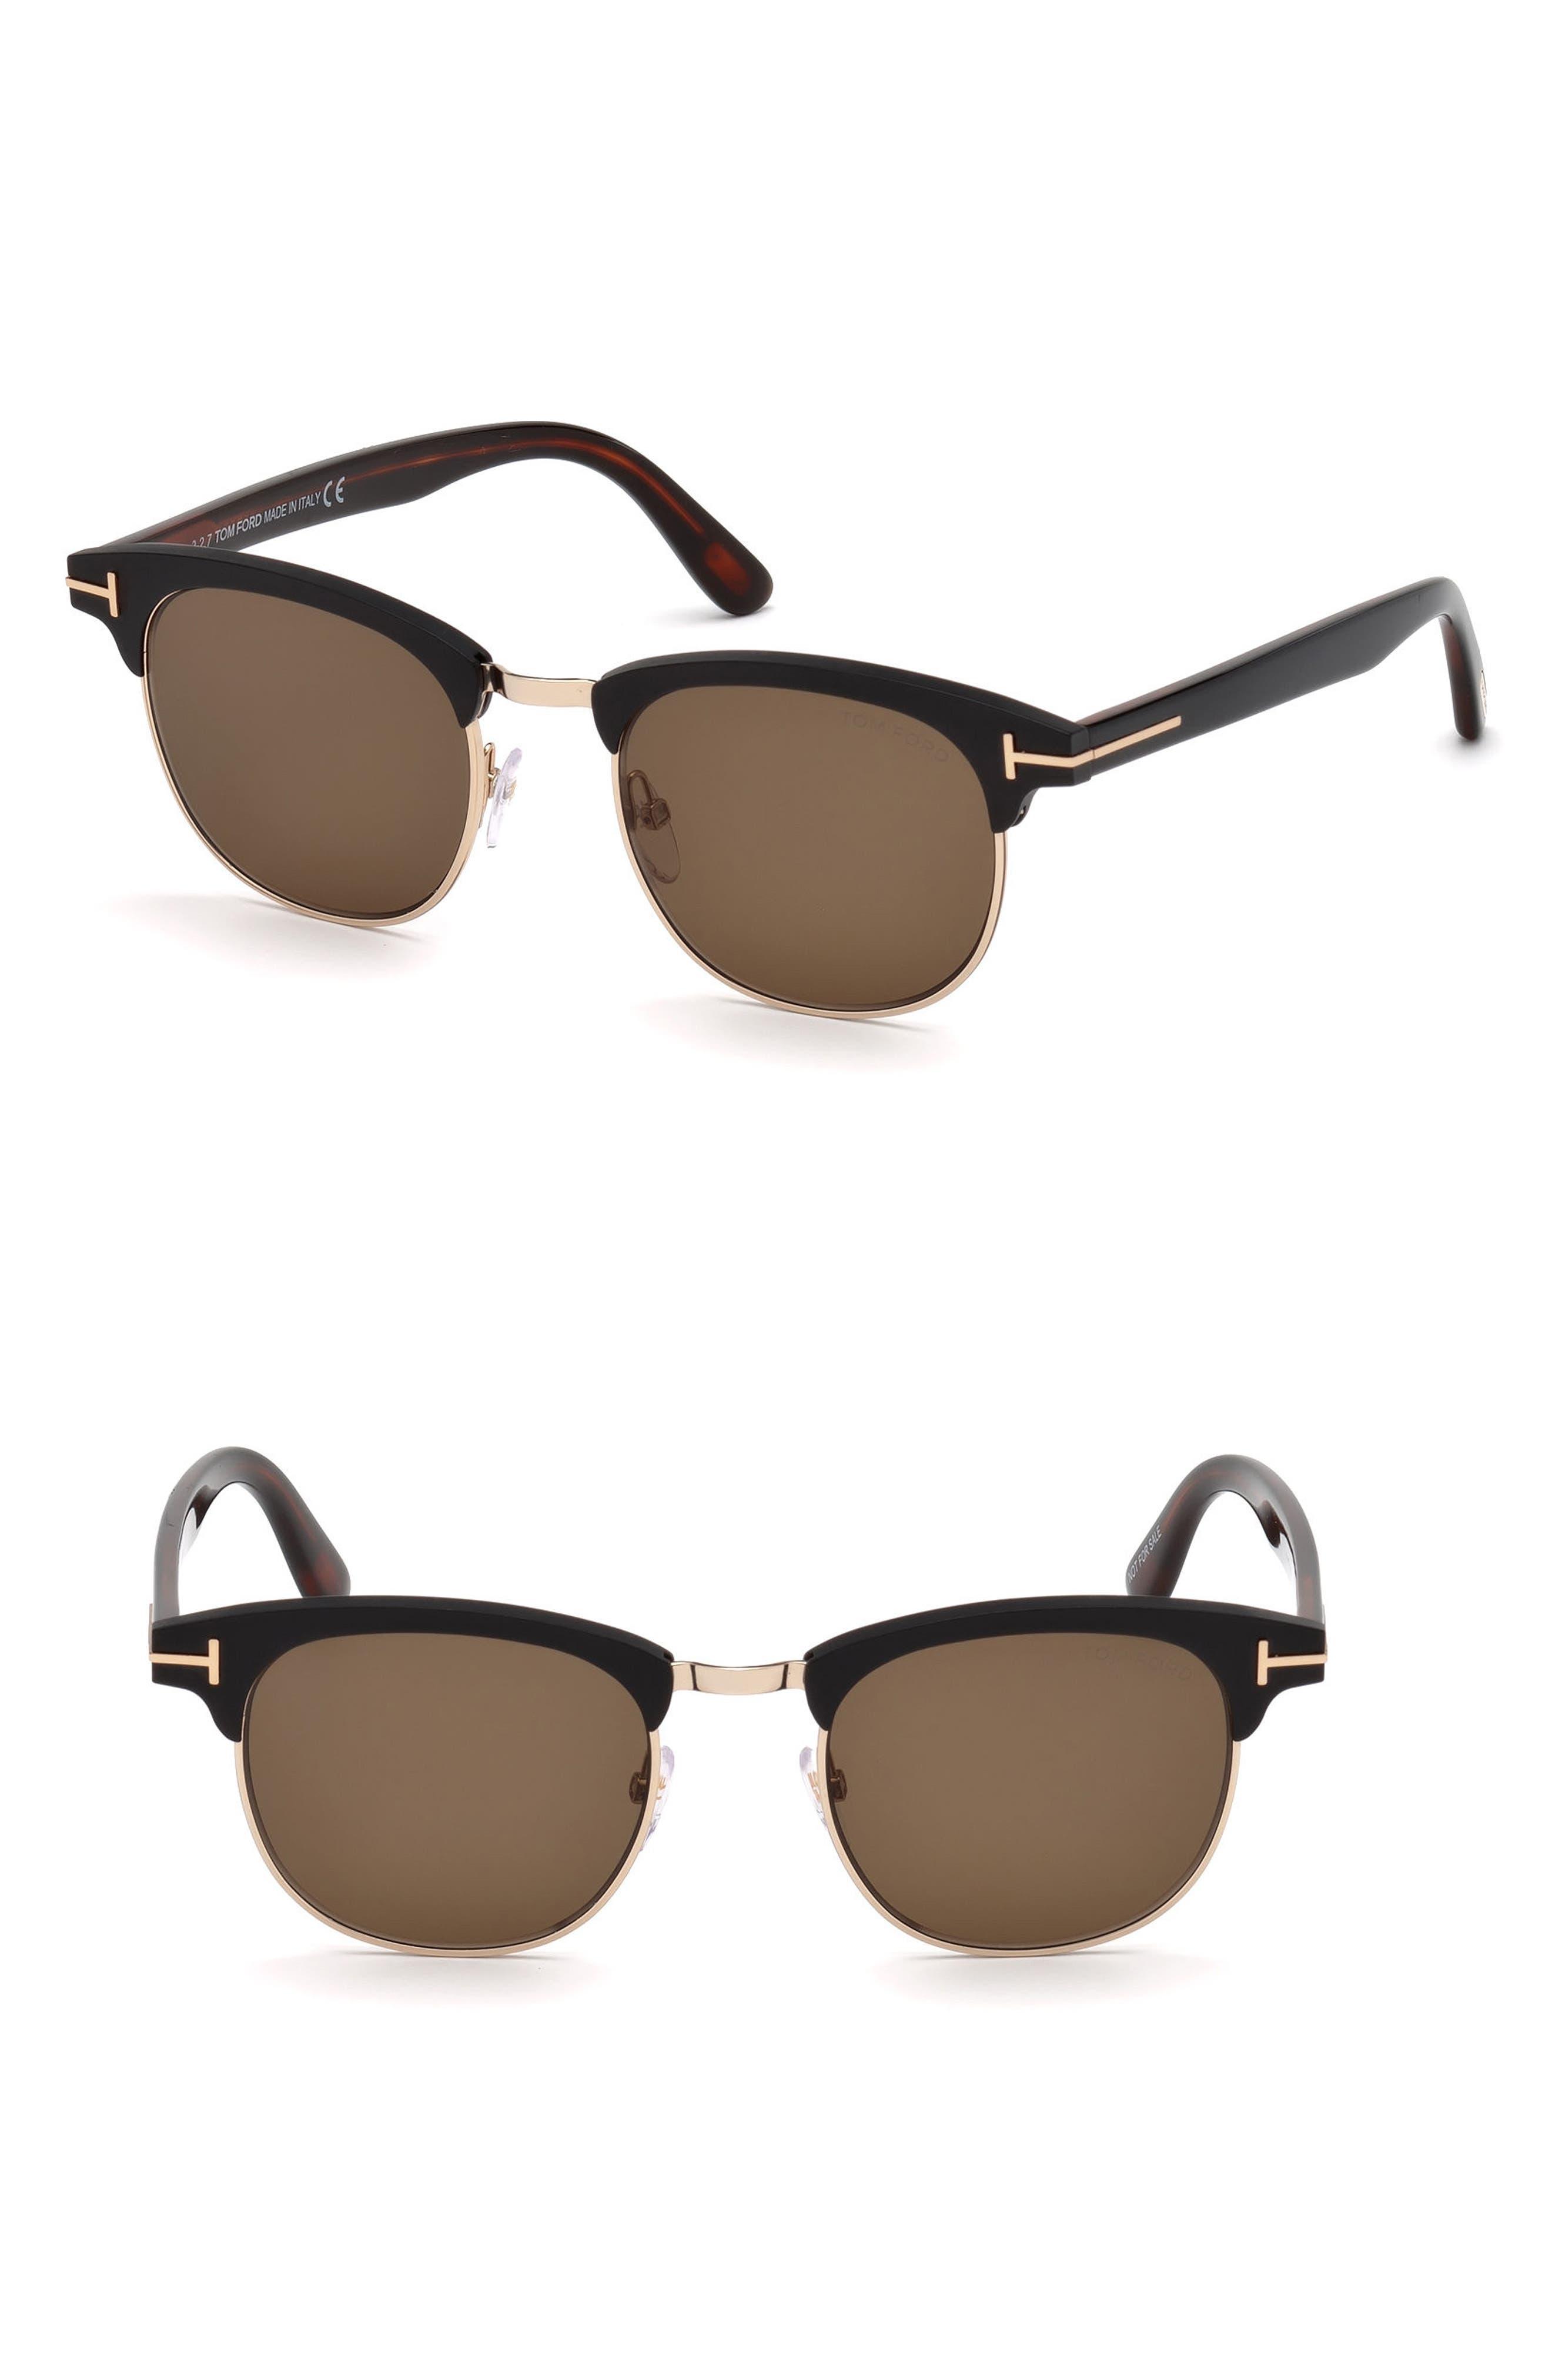 Laurent 51mm Sunglasses,                         Main,                         color, MATTE BLACK / ROVIEX